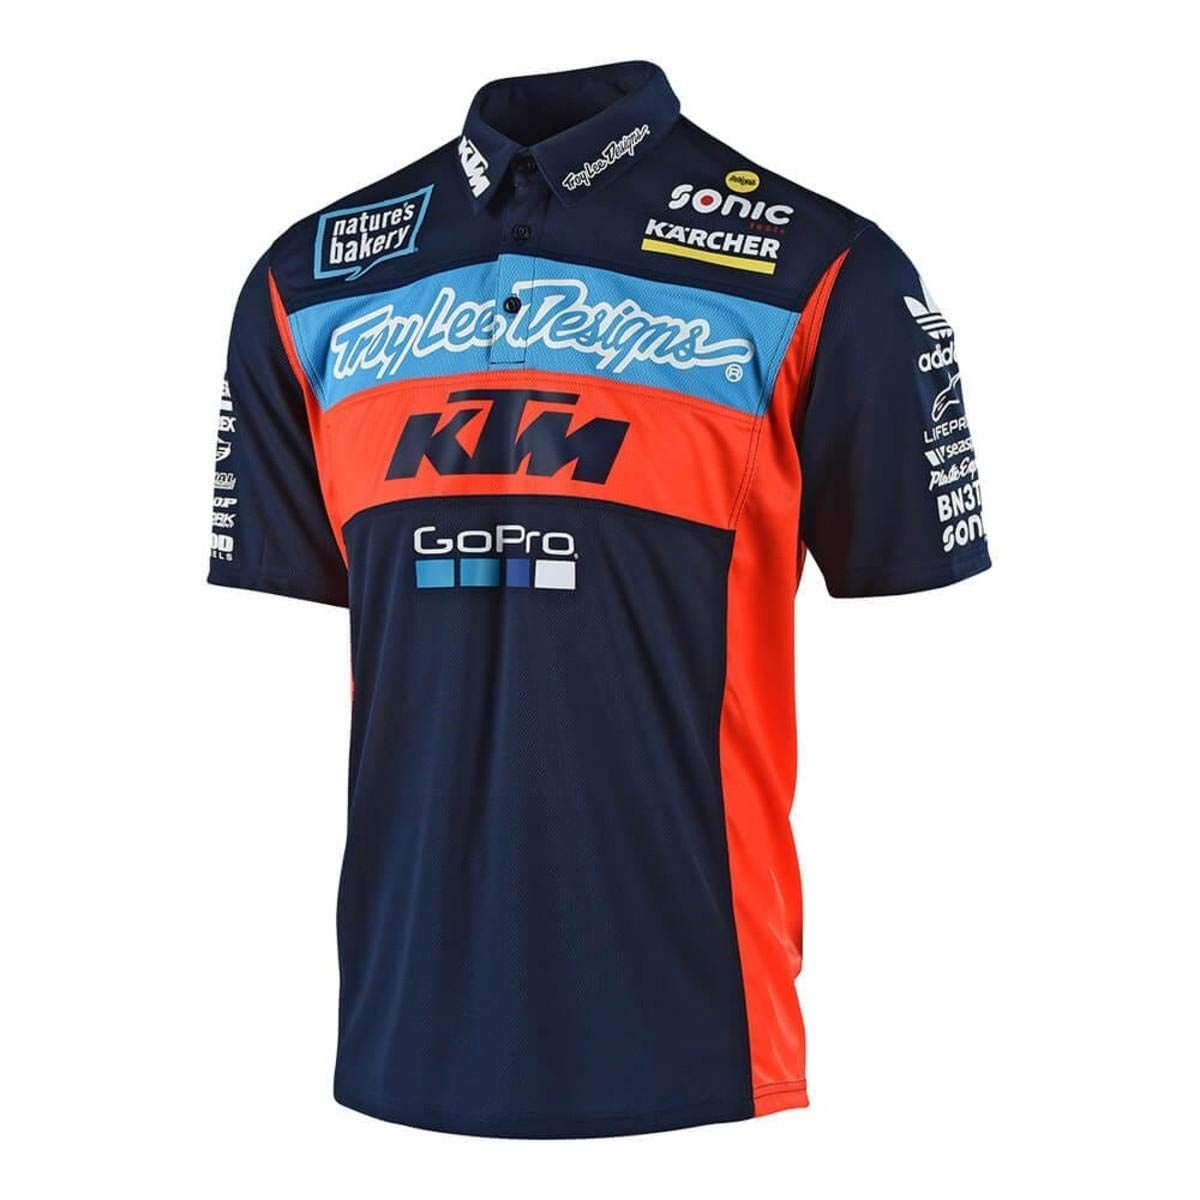 Troy Lee Designs Official Team KTM Licensed Pit Polo Shirt